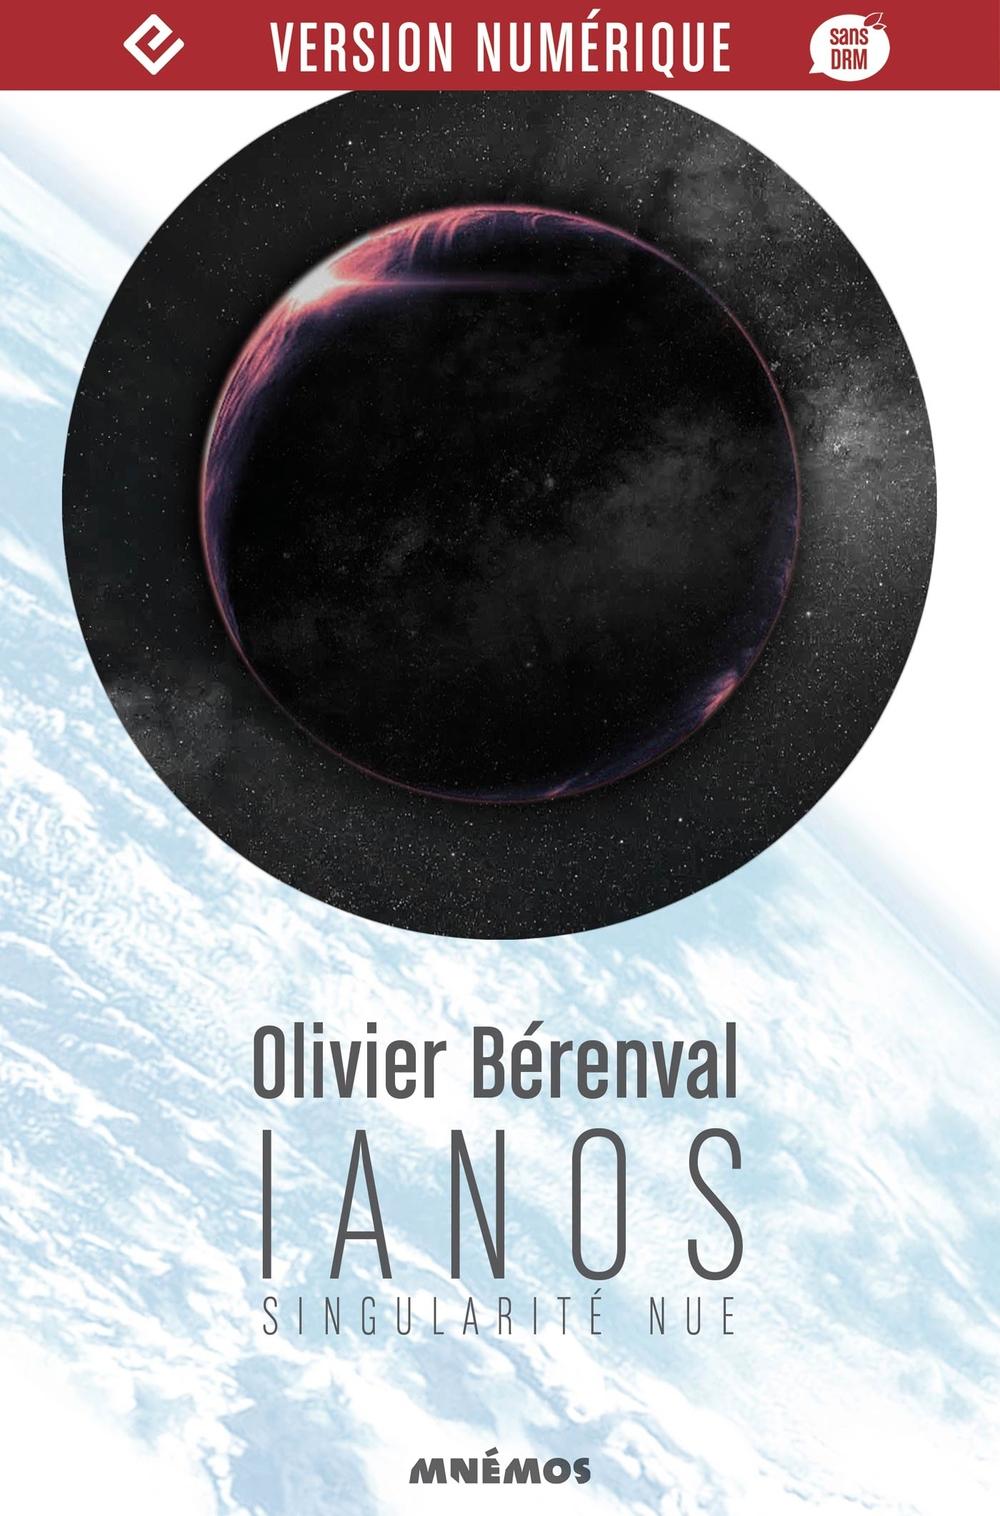 Ianos, singularité nue | BERENVAL, Olivier